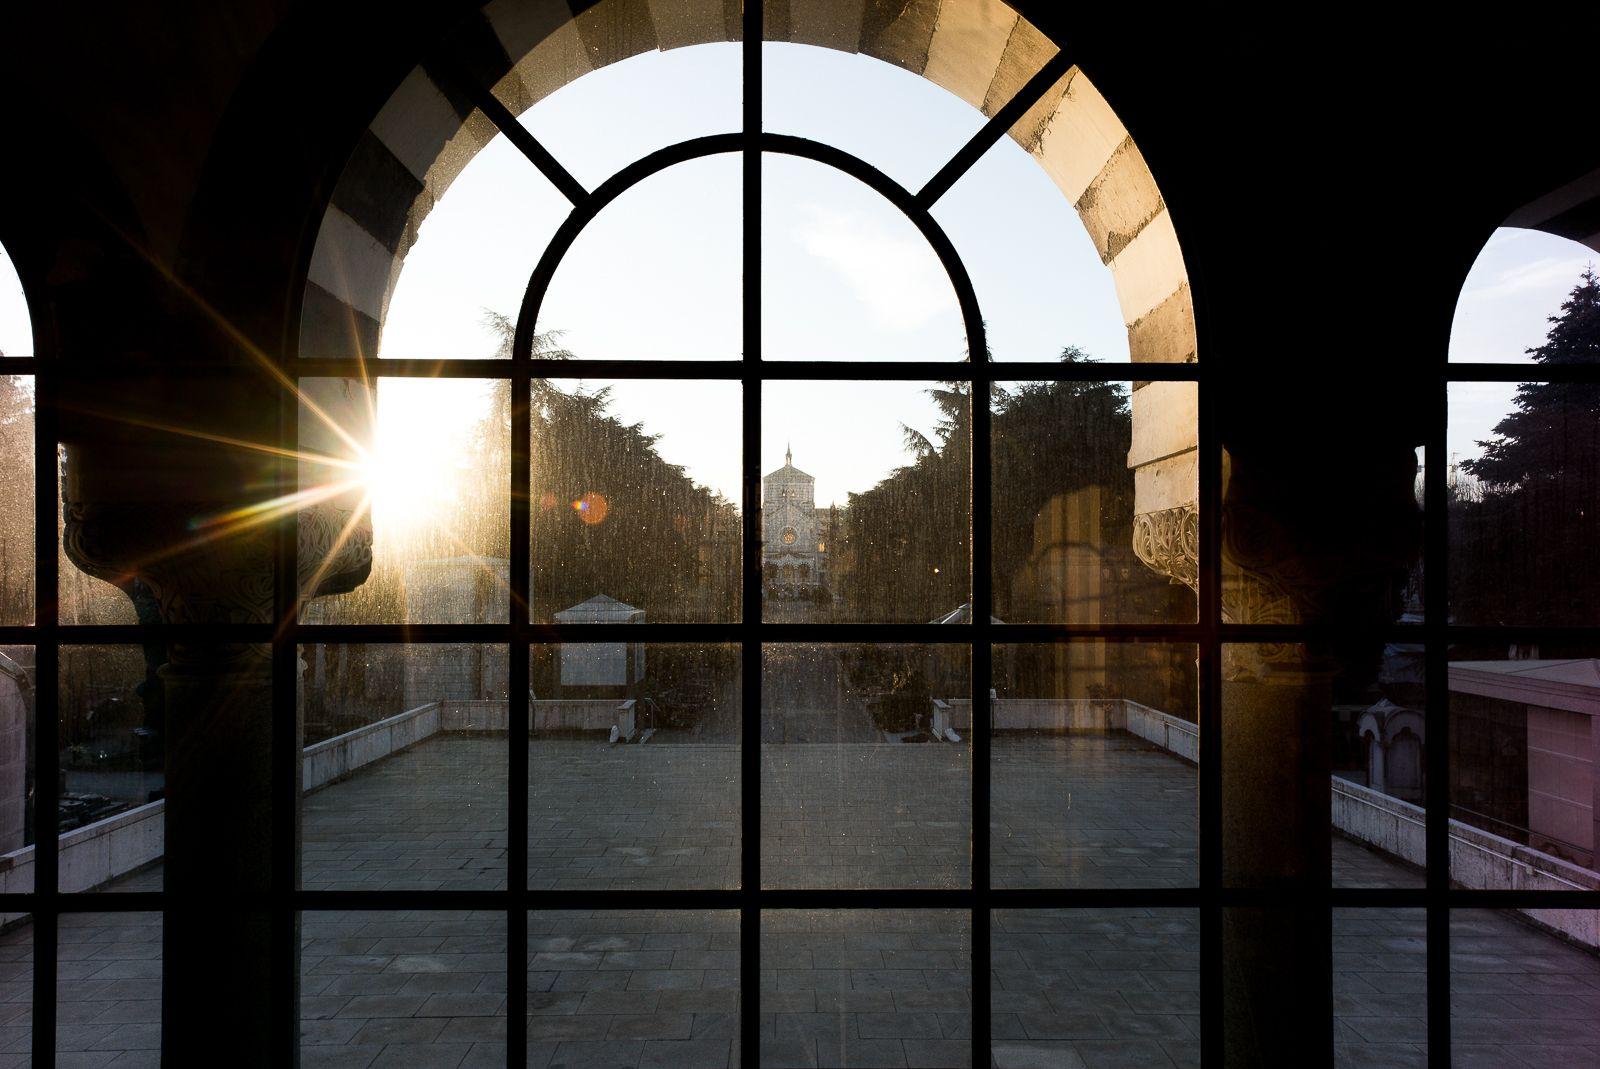 cimitero-monumentale-milano-famedio-vetrata.jpg